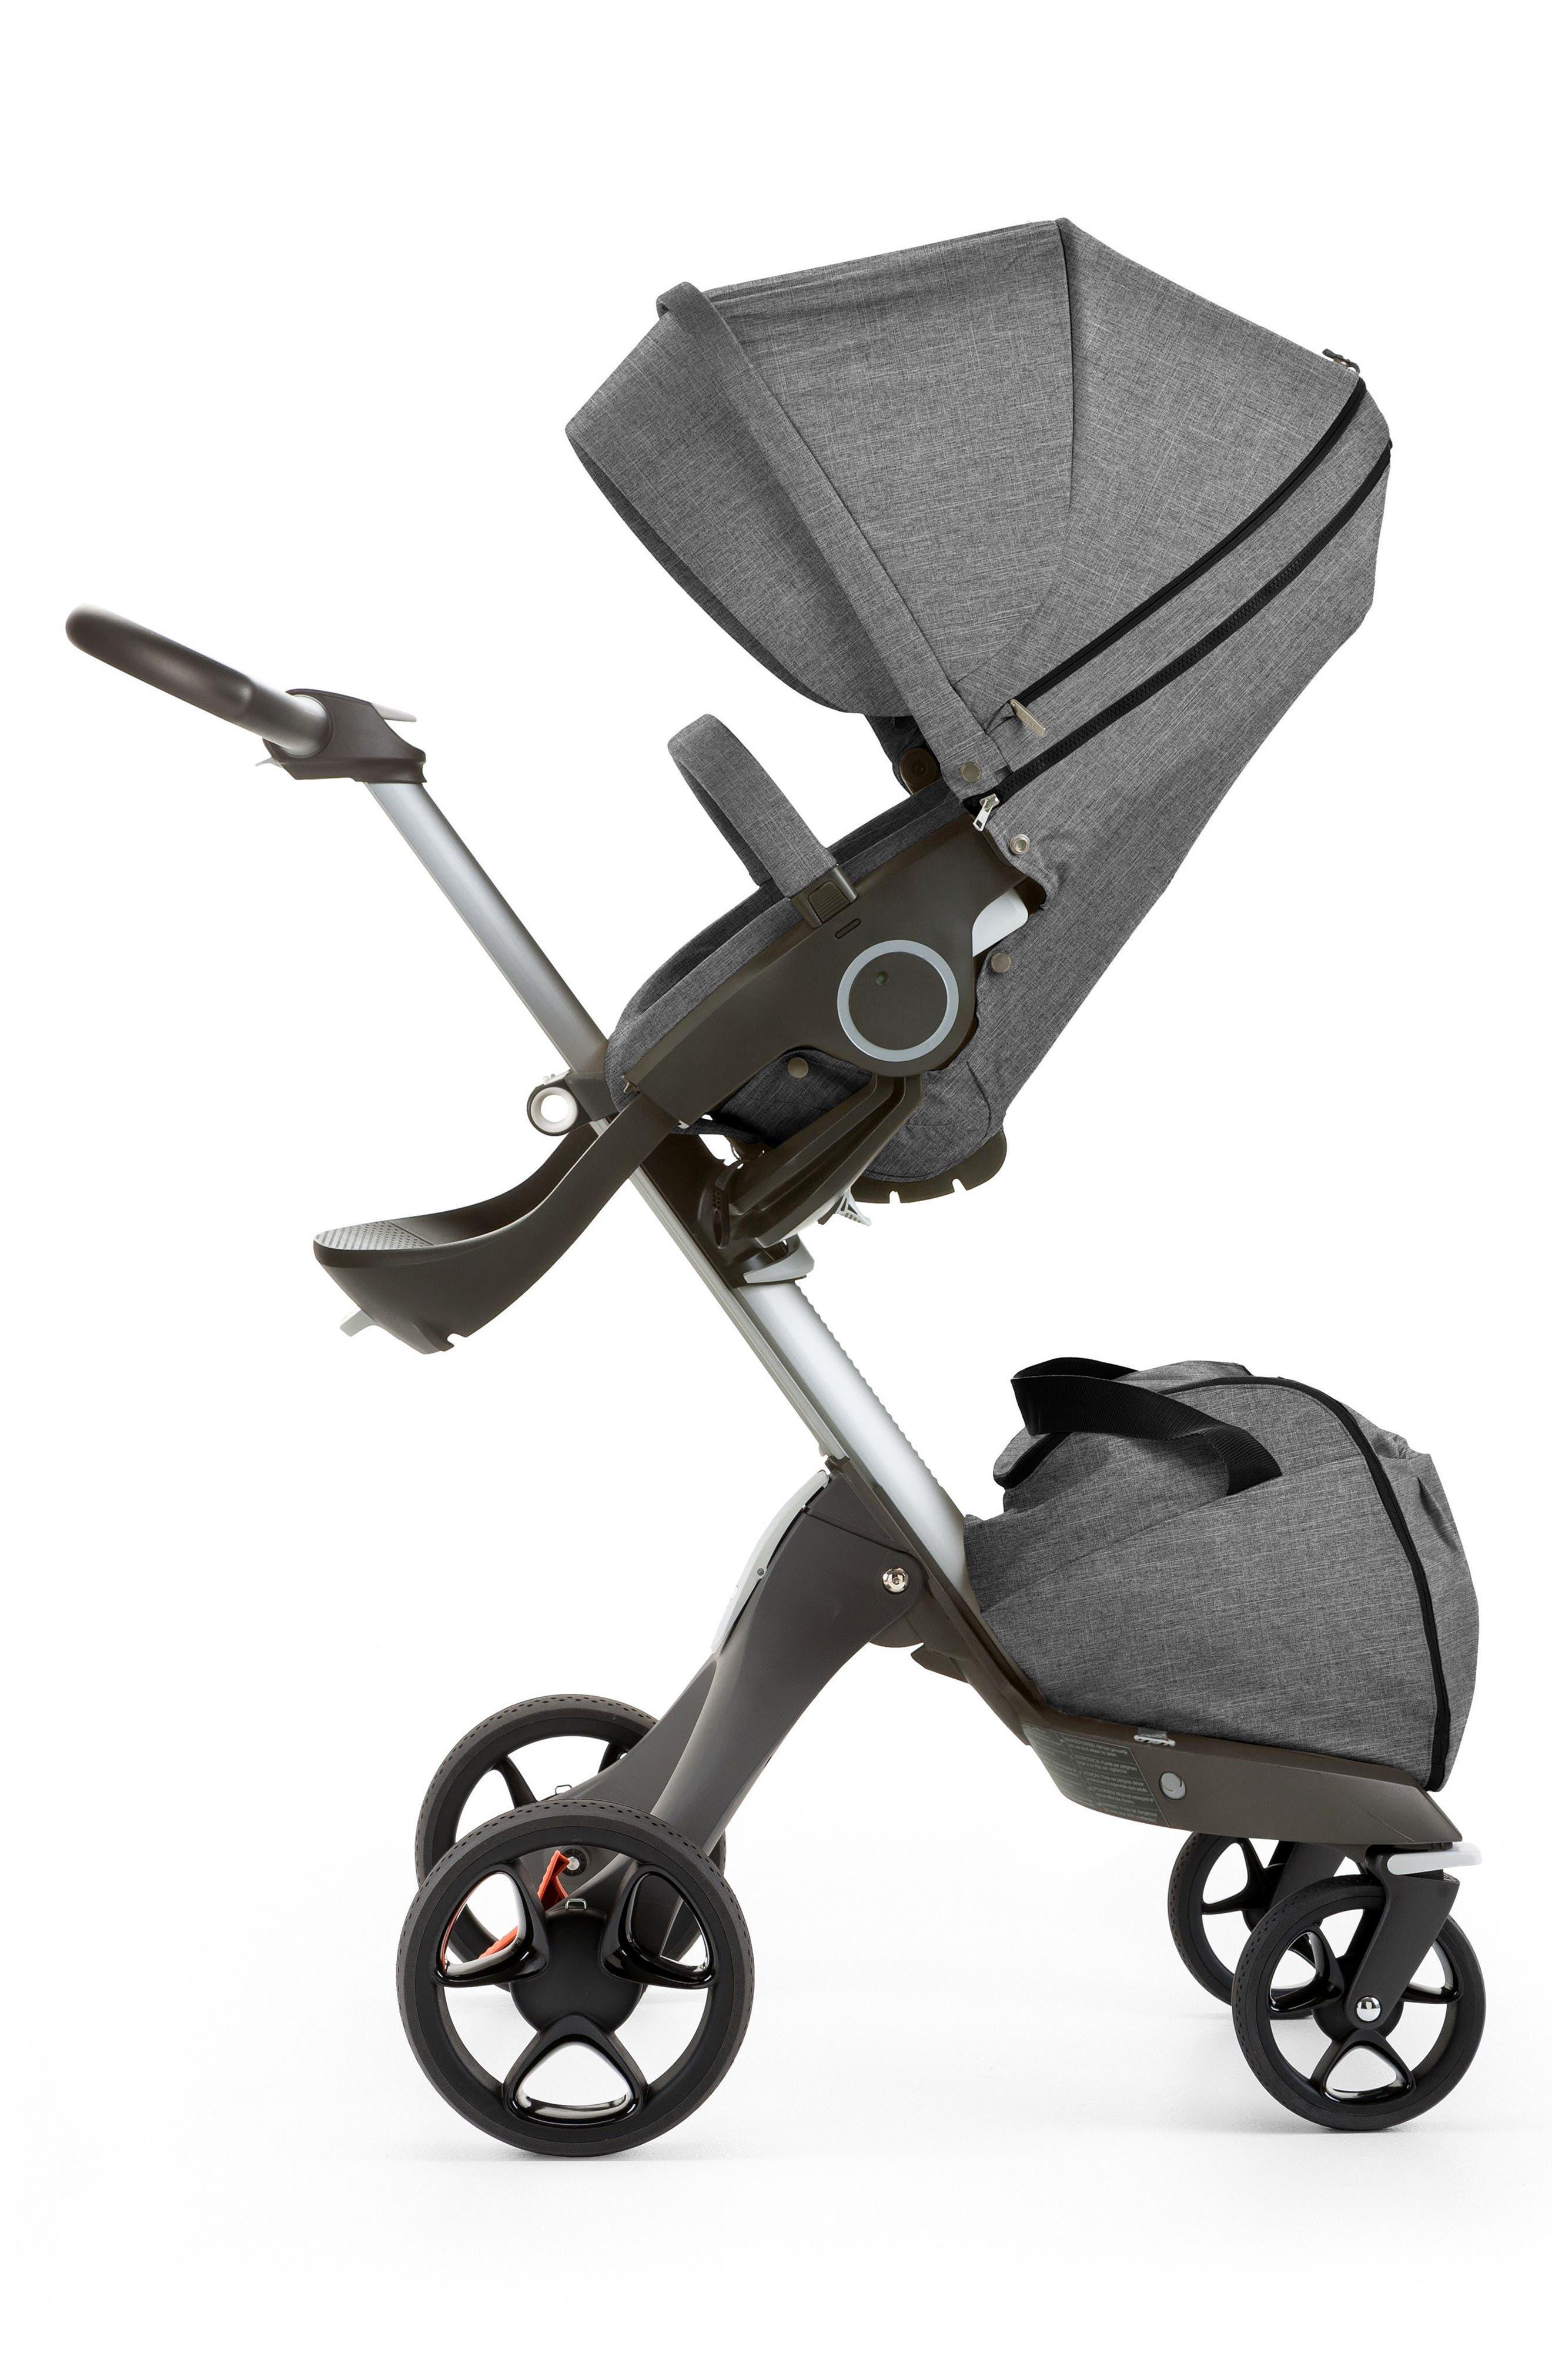 Main Image - Stokke Xplory® V5 Stroller